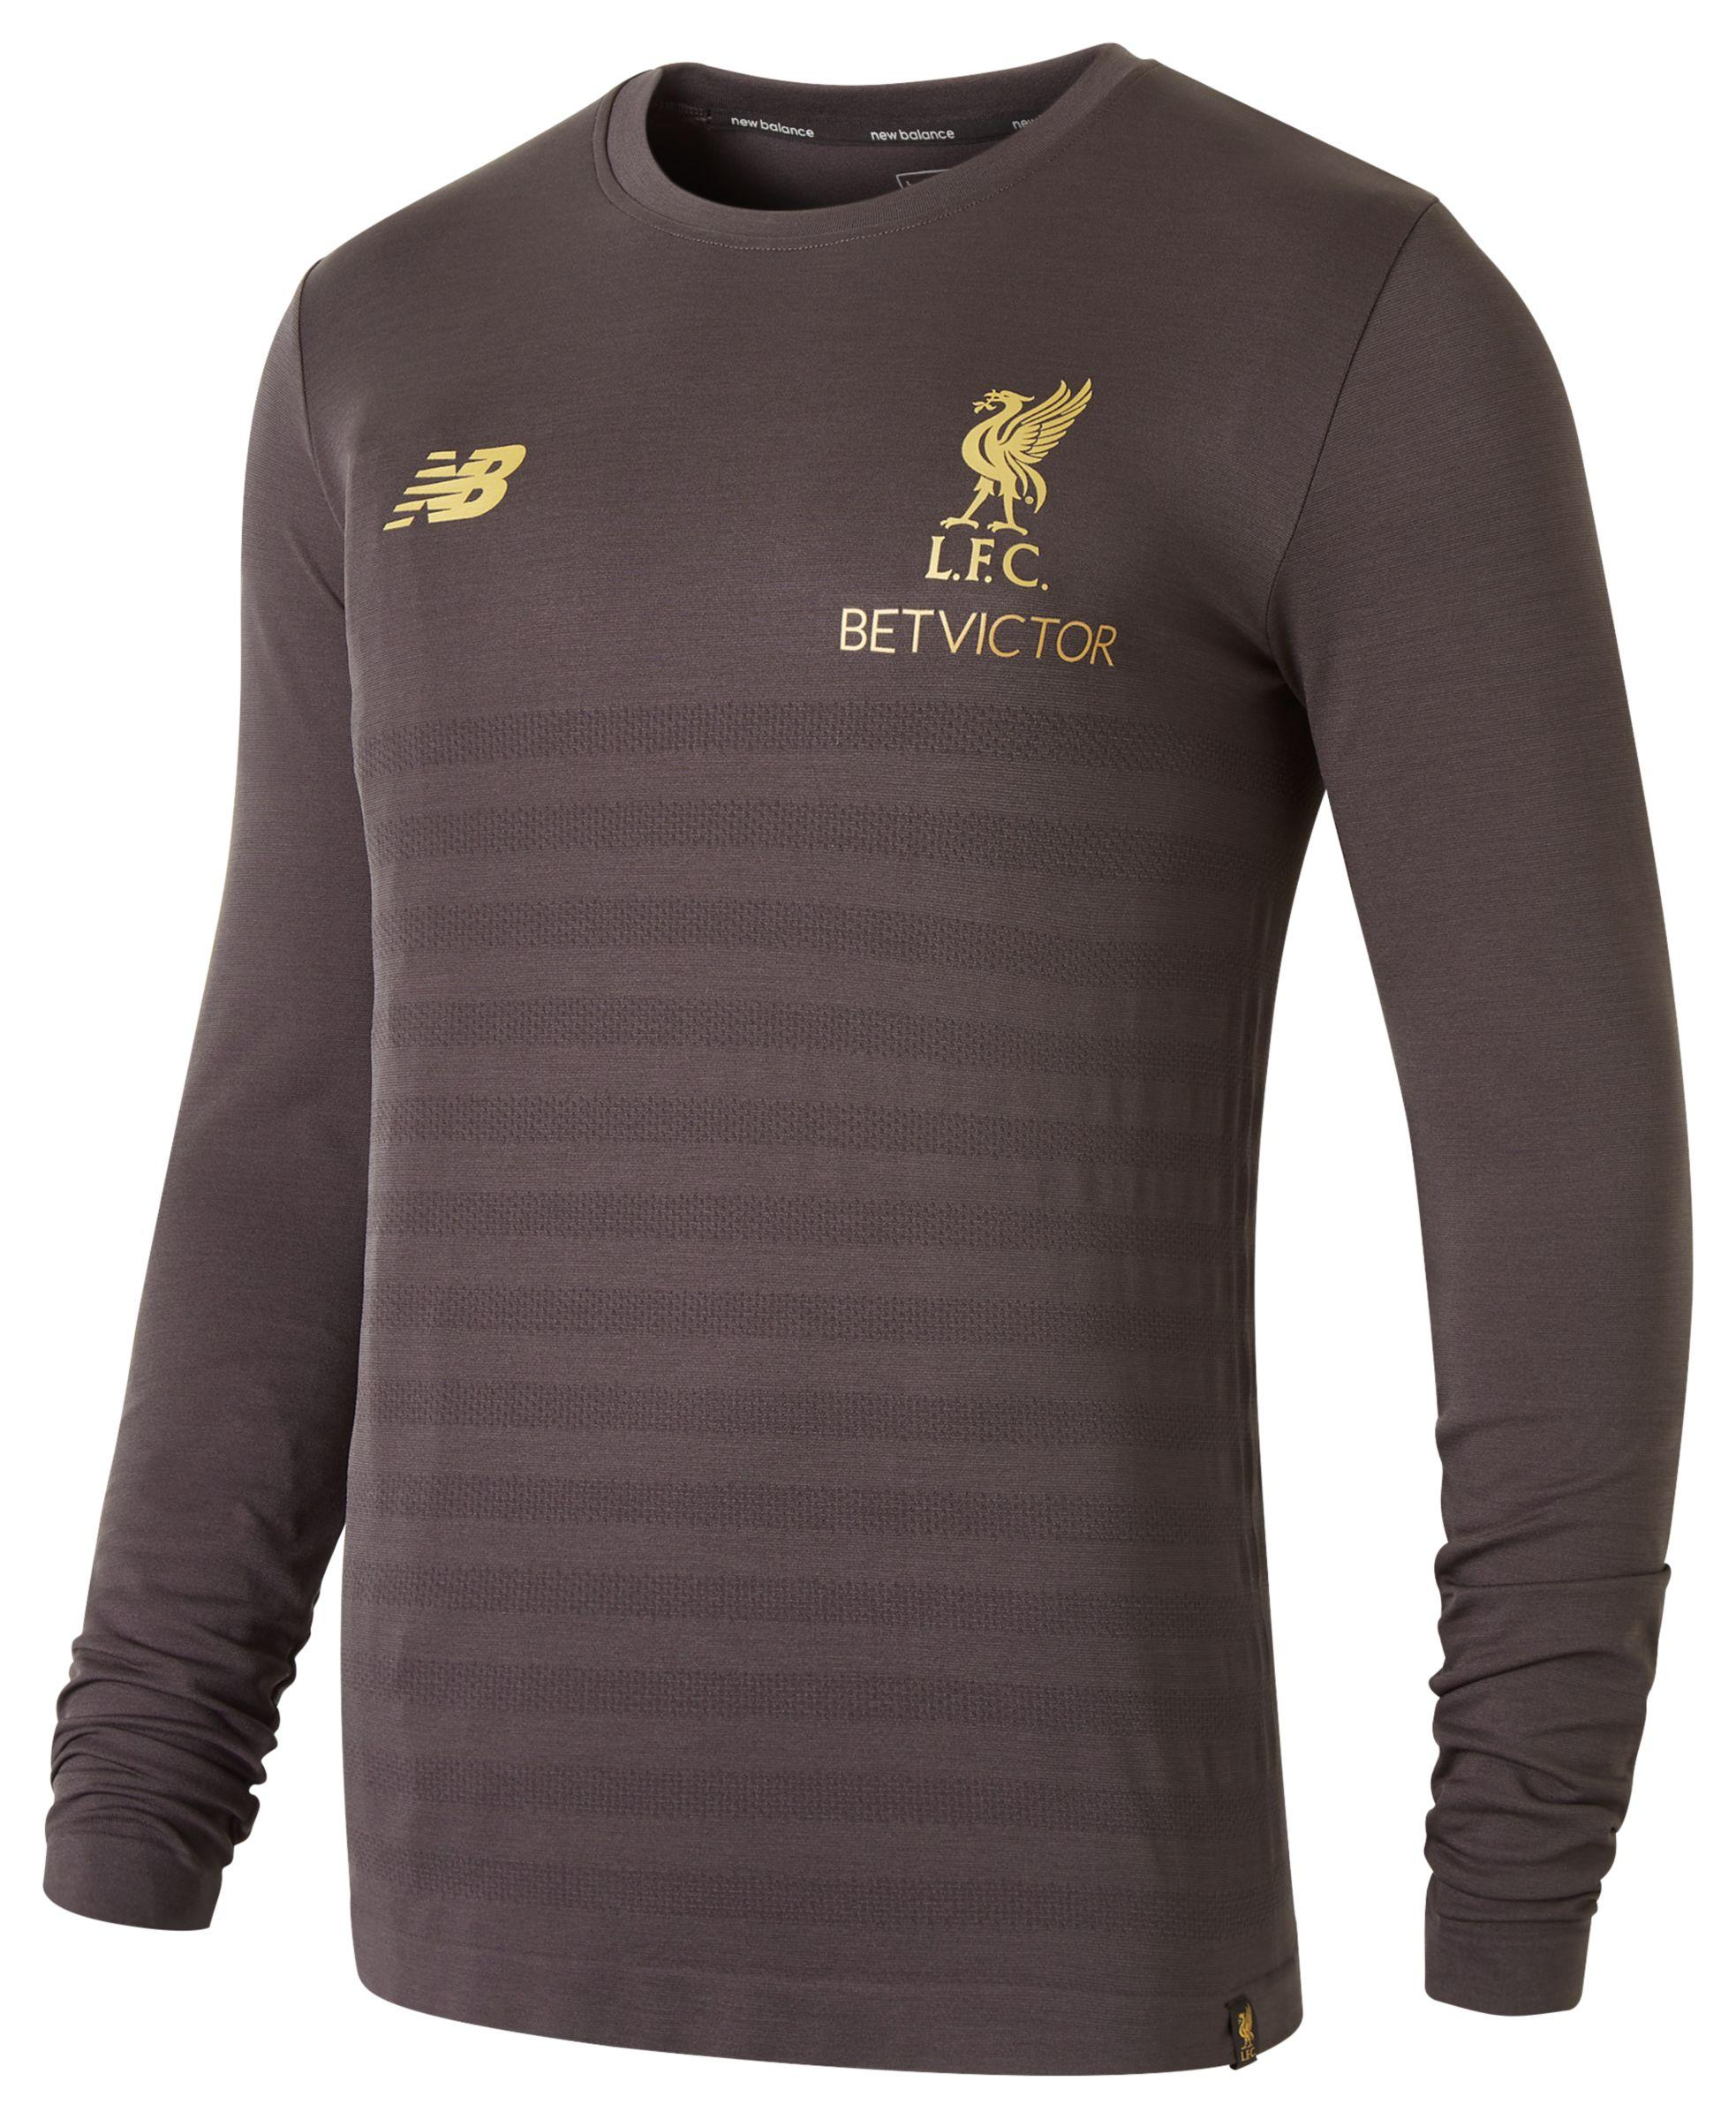 8c0a71fff New Balance New Balance Liverpool Fc Managers Long Sleeve Seamless ...